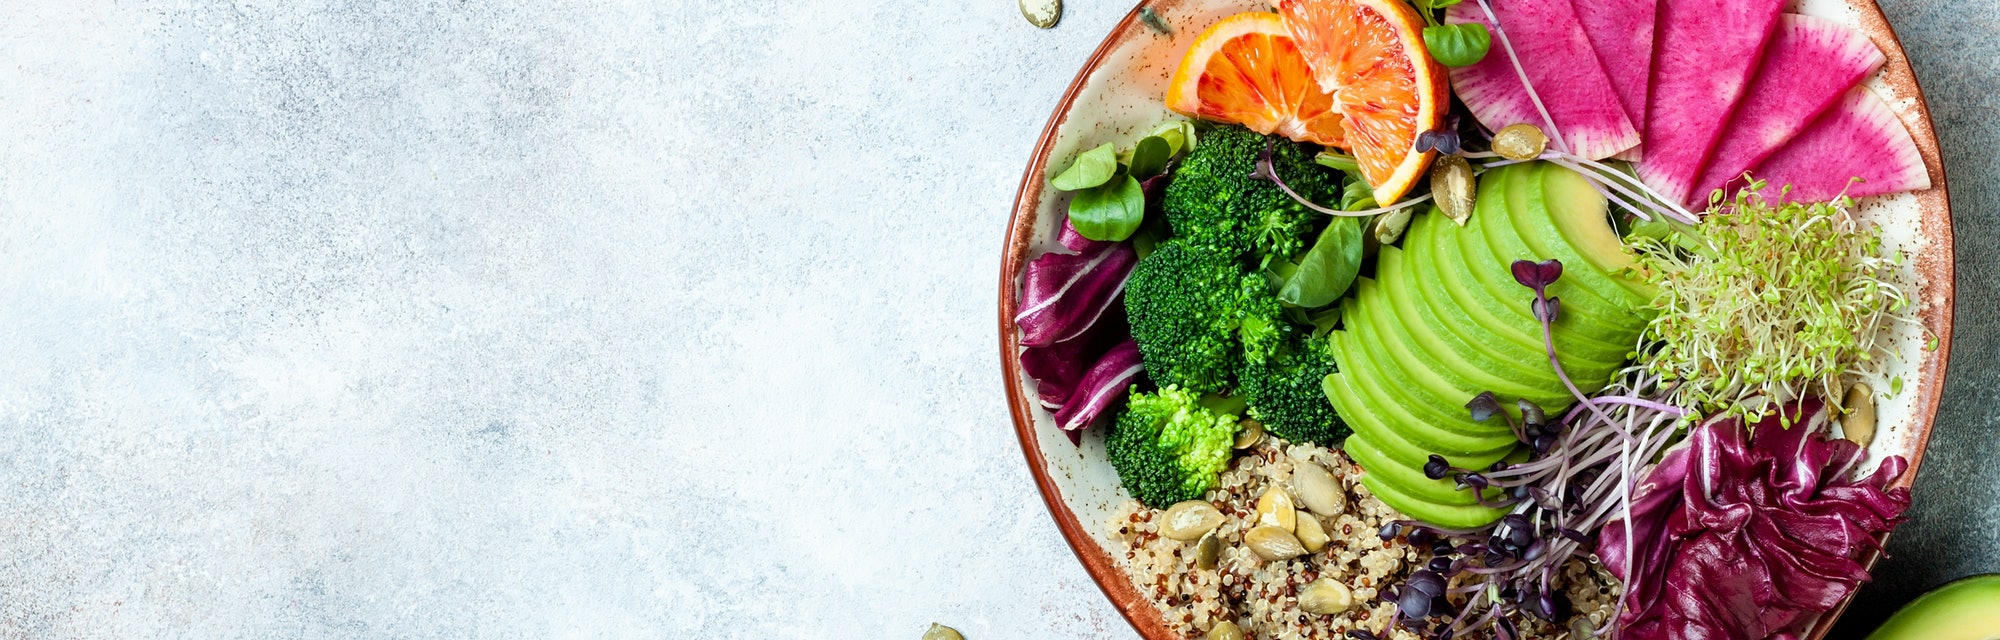 Vegan, detox Buddha bowl with quinoa, micro greens, avocado, blood orange, broccoli, watermelon radish, alfalfa seed sprouts.